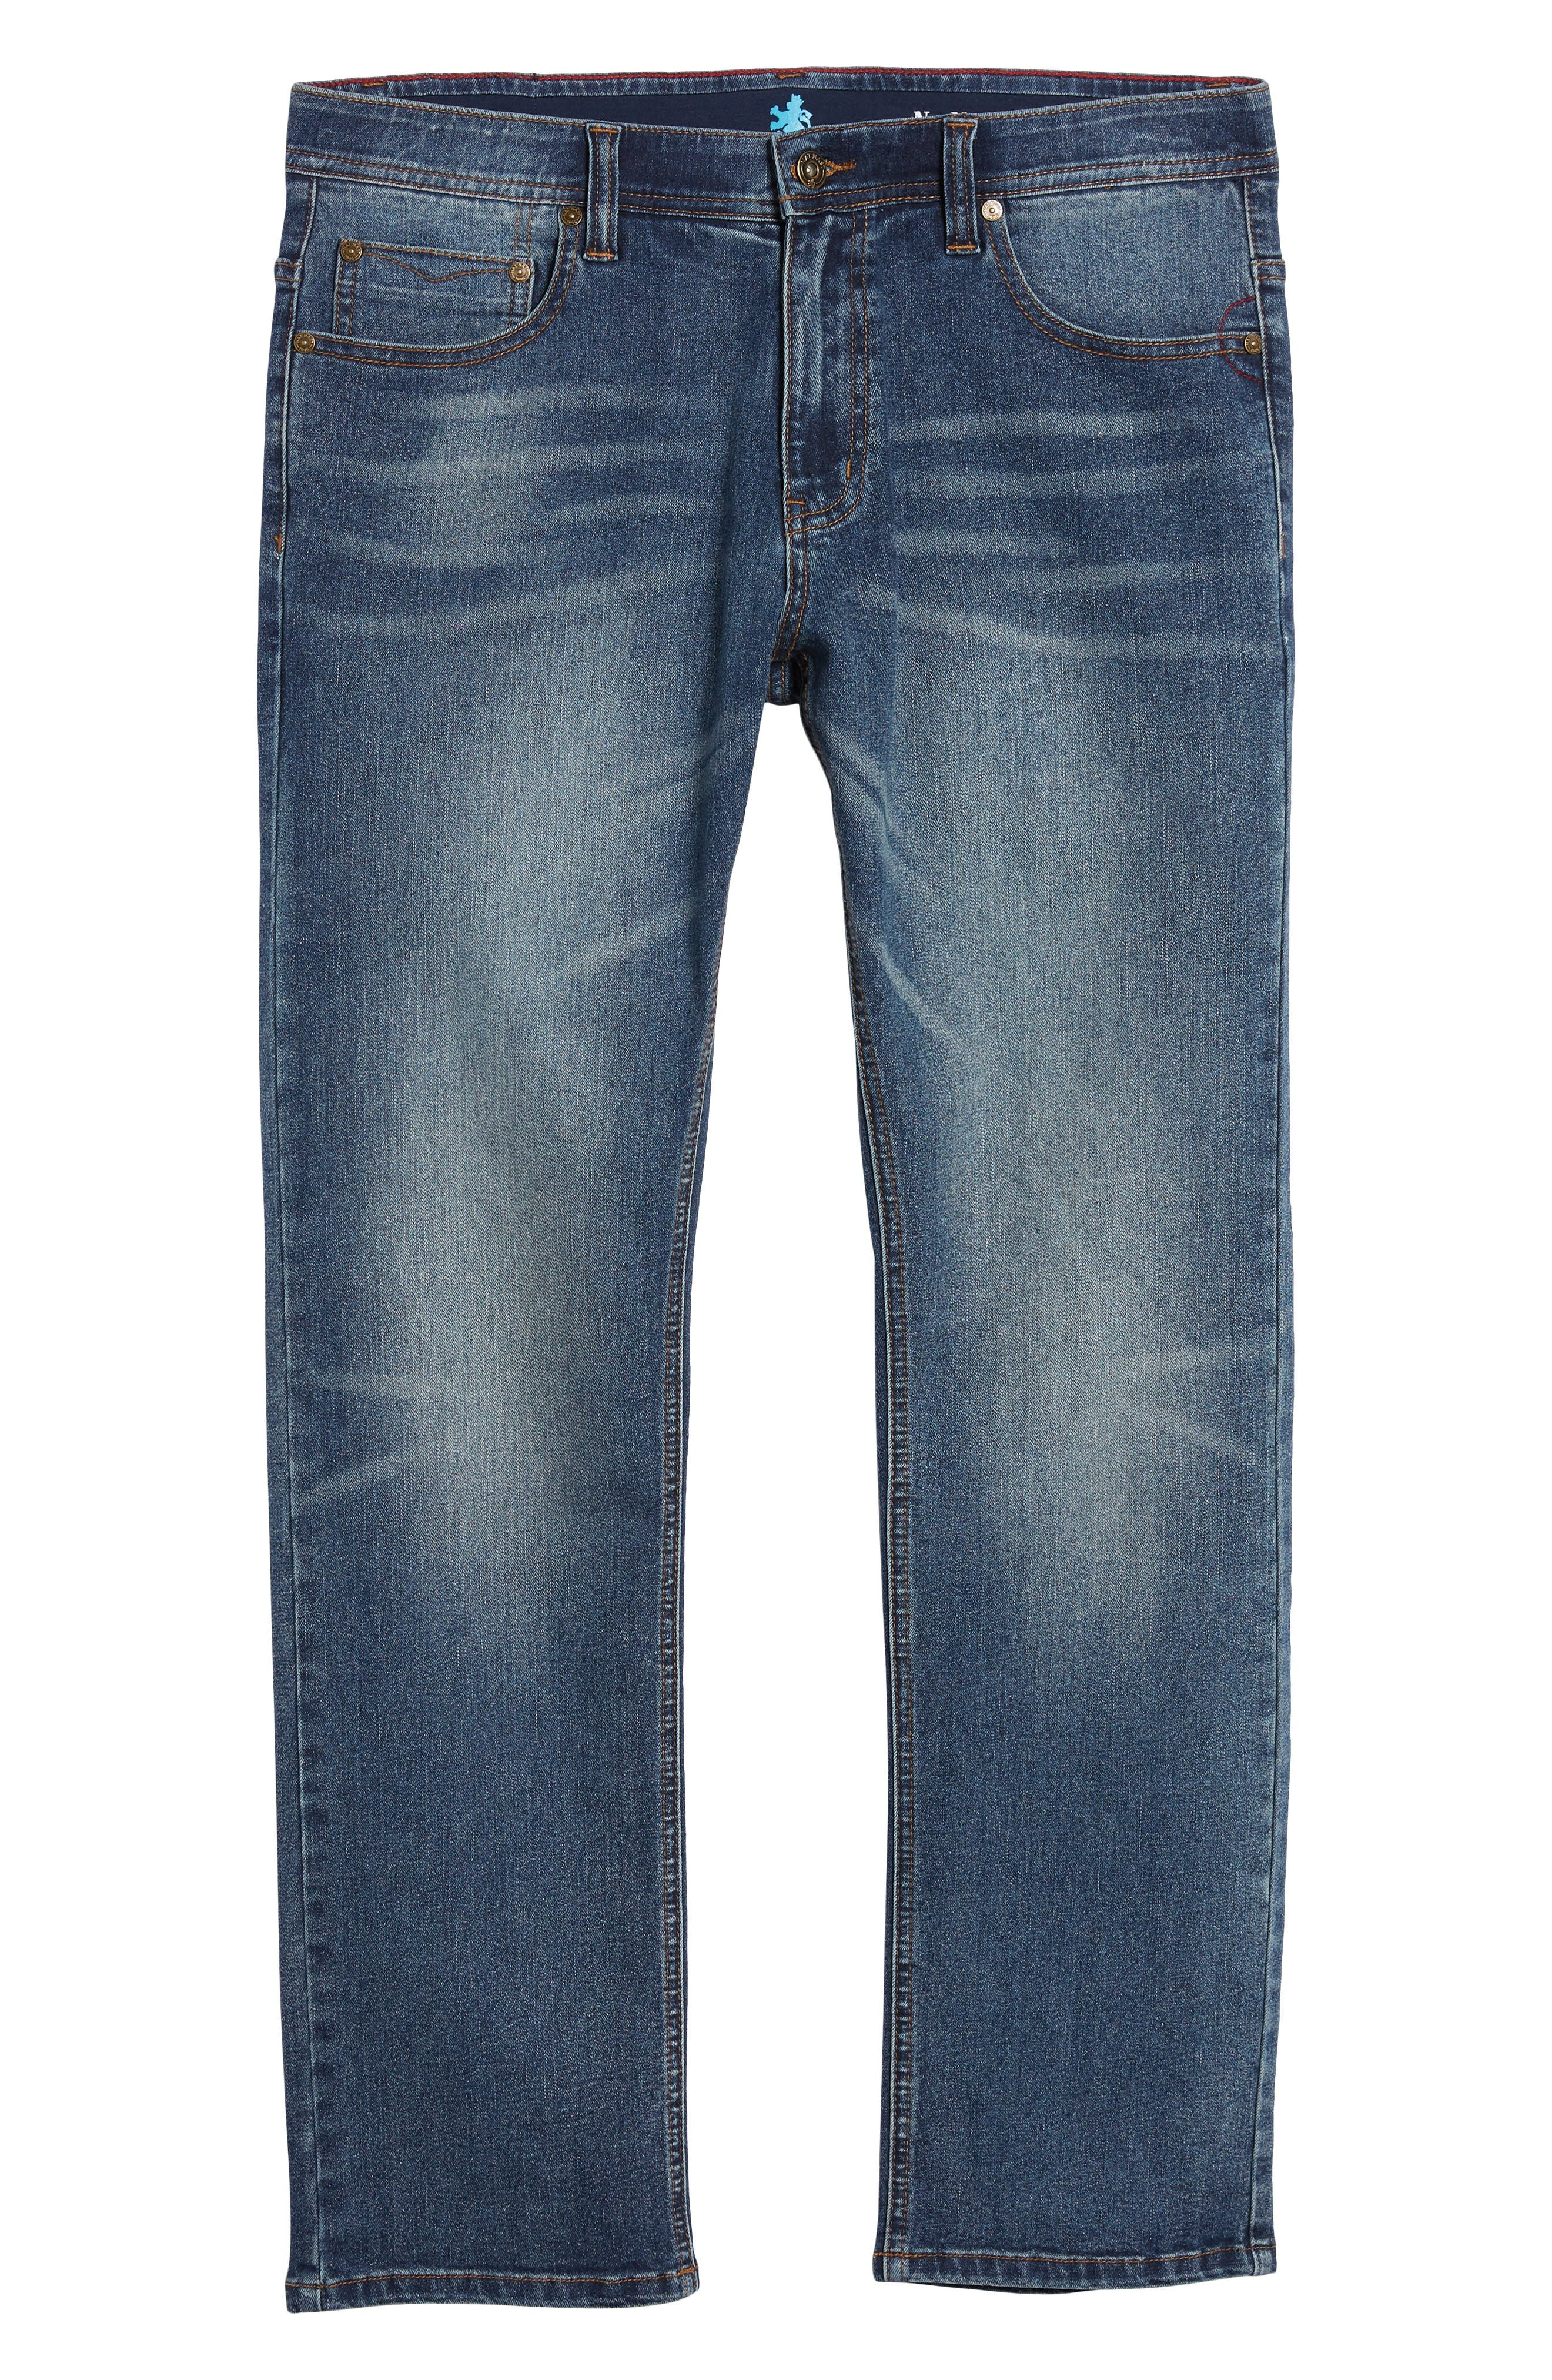 Maverick Stretch Slim Fit Jeans,                             Alternate thumbnail 6, color,                             MAVERICK WASH